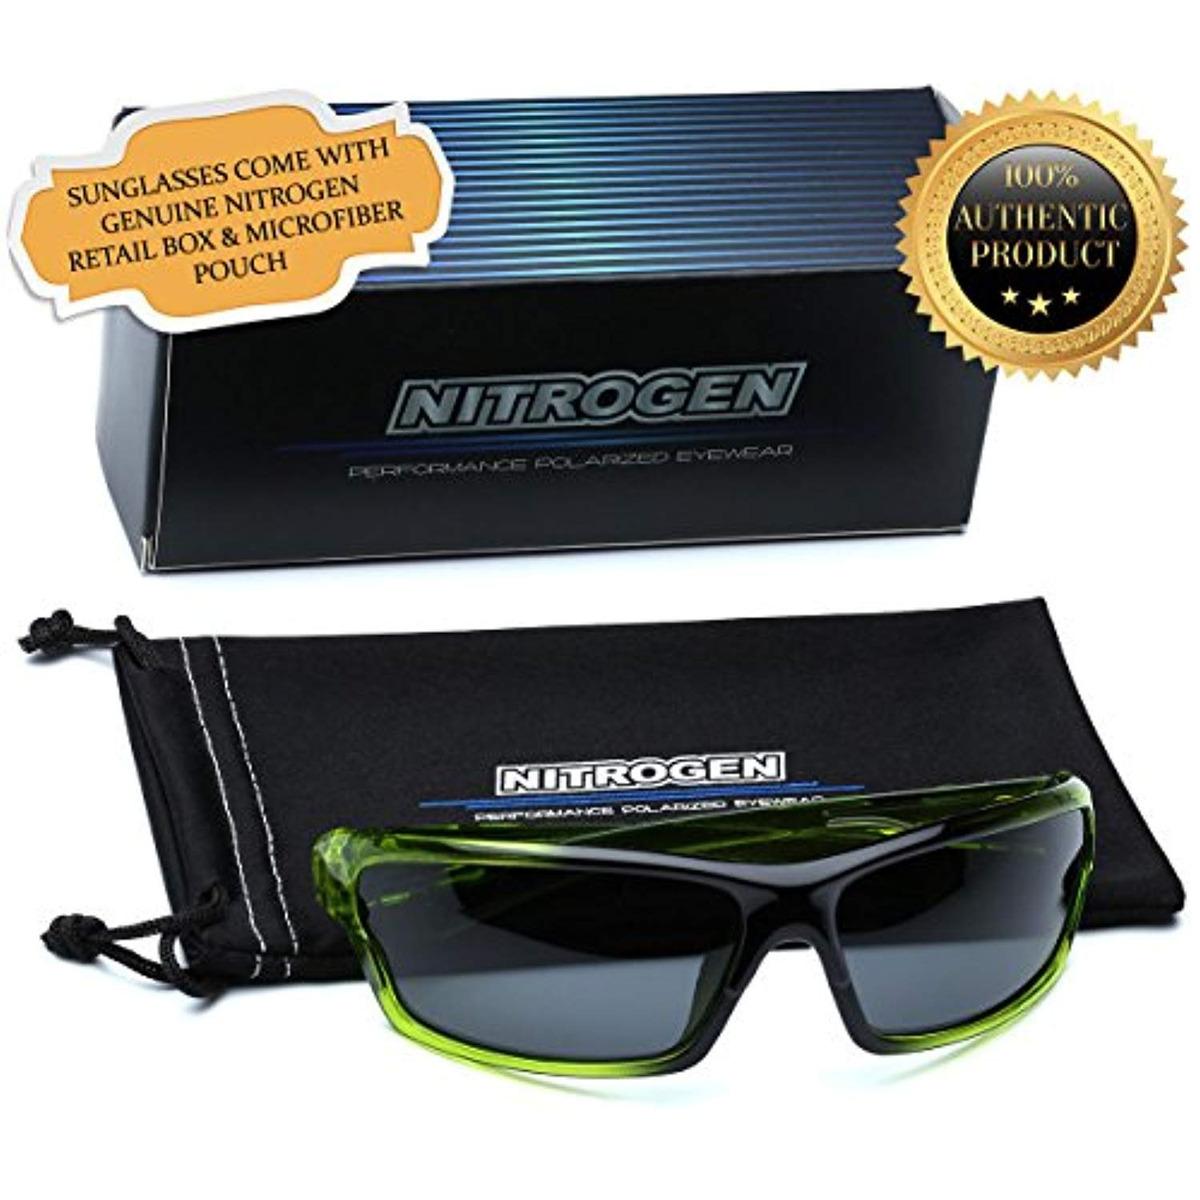 Sol 599 Lima88 Polarizadas De En Gafas Diseño Con Envolvente OnX8wPN0kZ